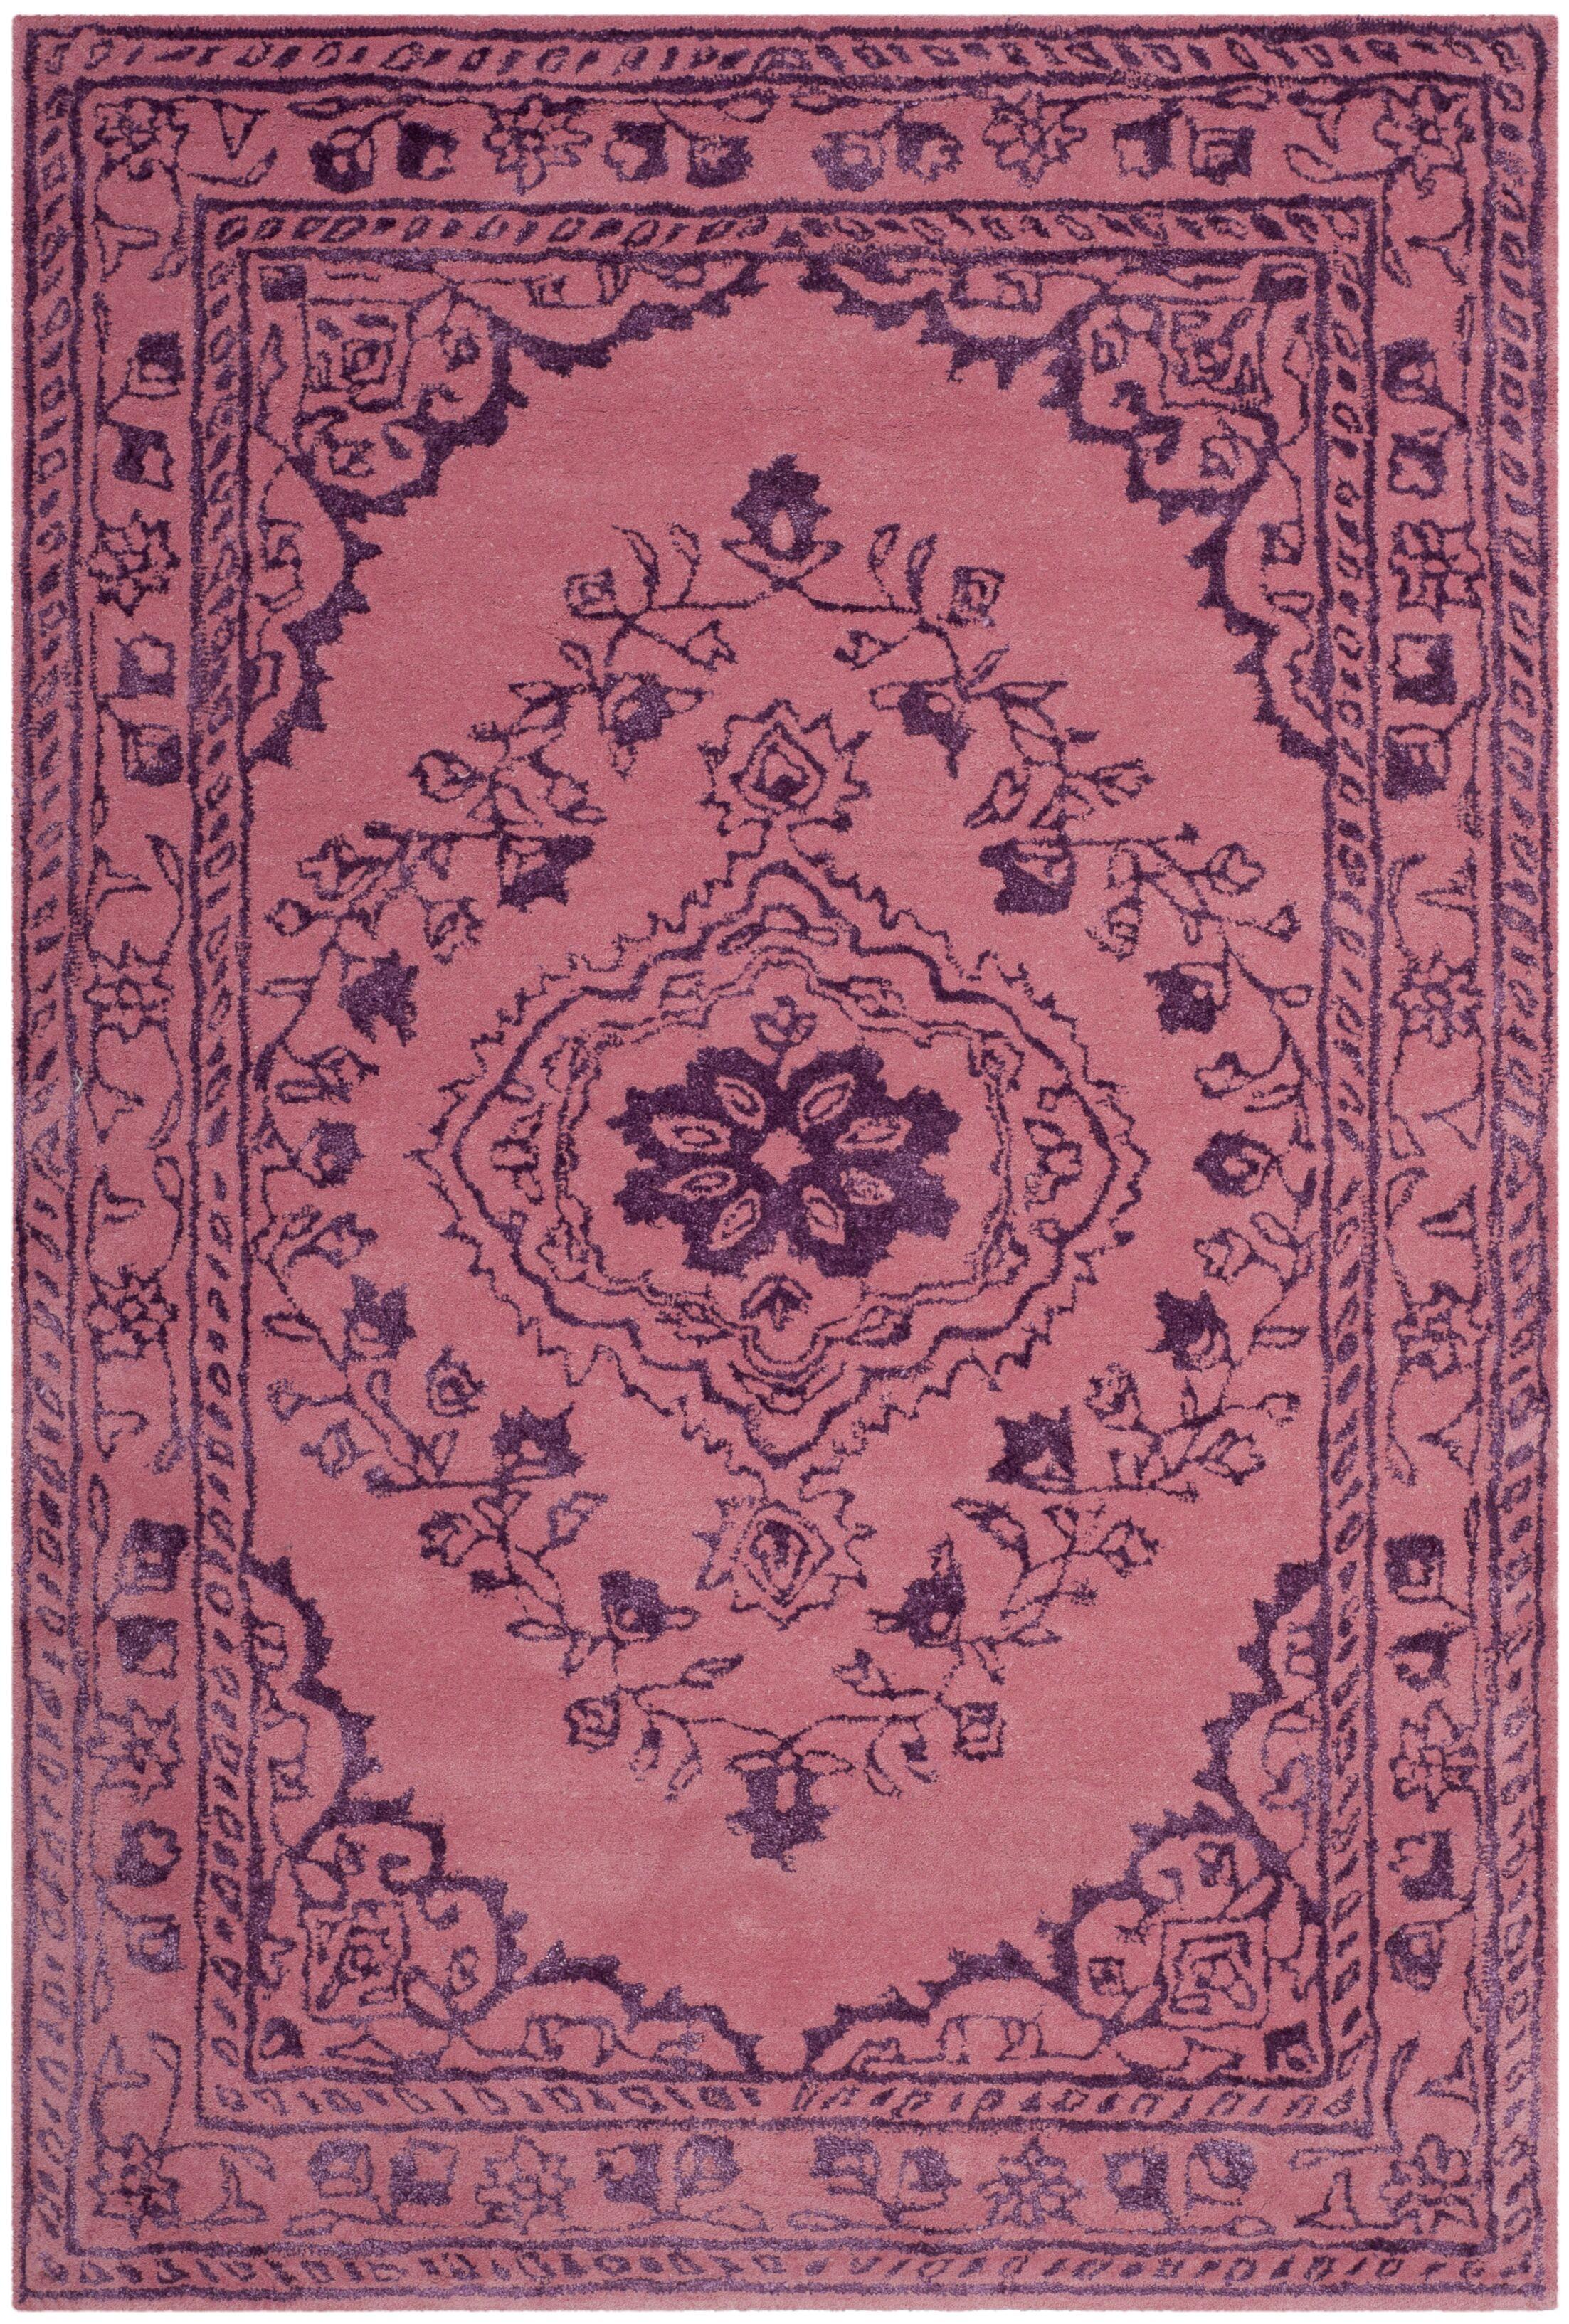 Samaniego Hand-Tufted Pink Area Rug Rug Size: Rectangle 4' x 6'